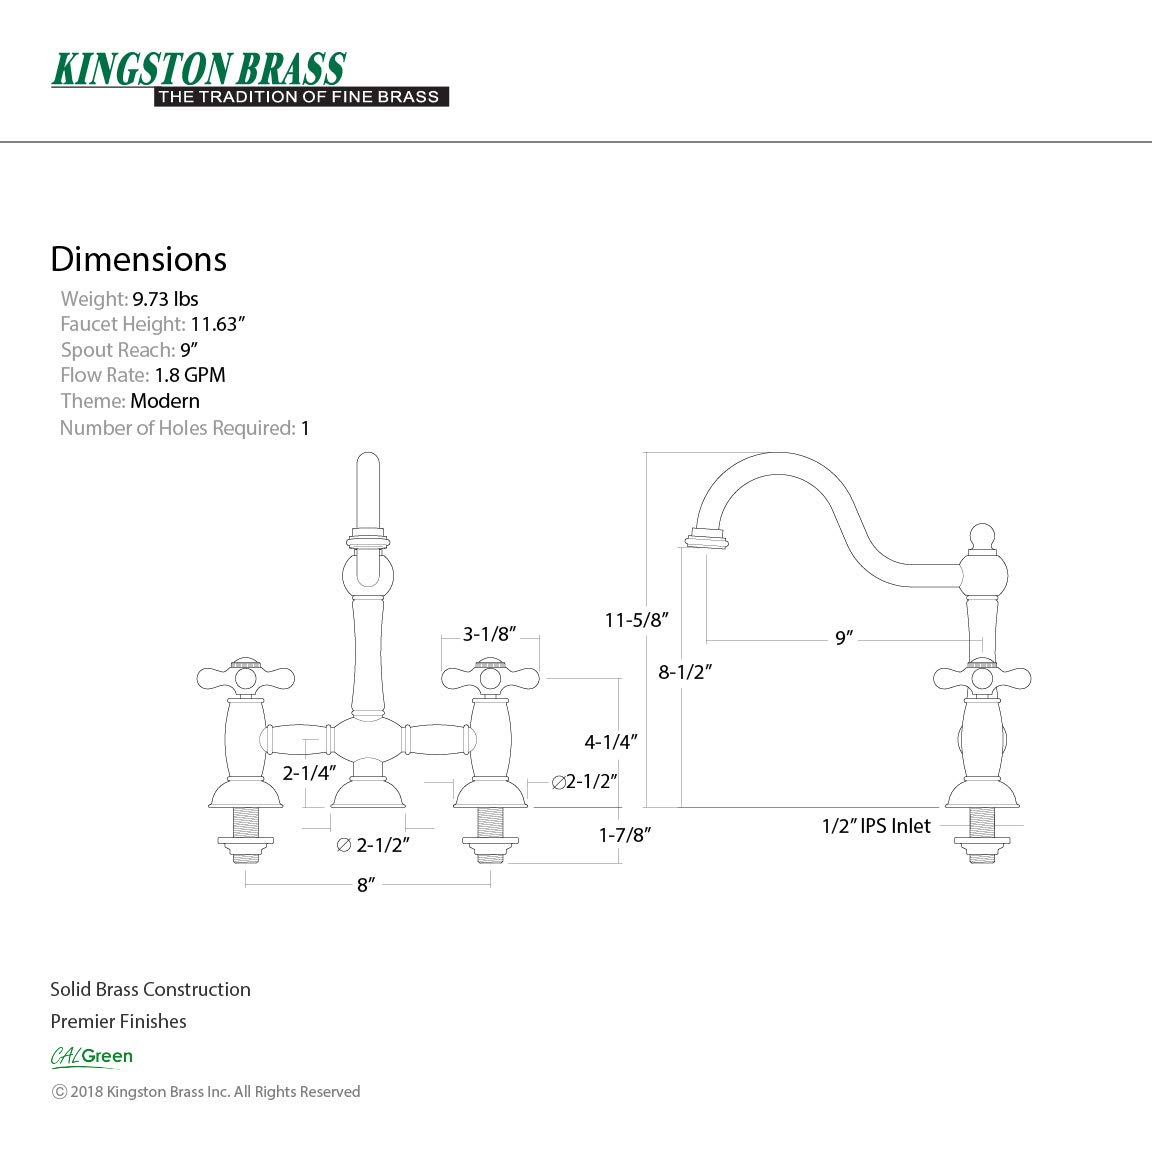 Kingston Brass KS3788AX Restoration 8-Inch Kitchen Faucet without Sprayer Brushed Nickel